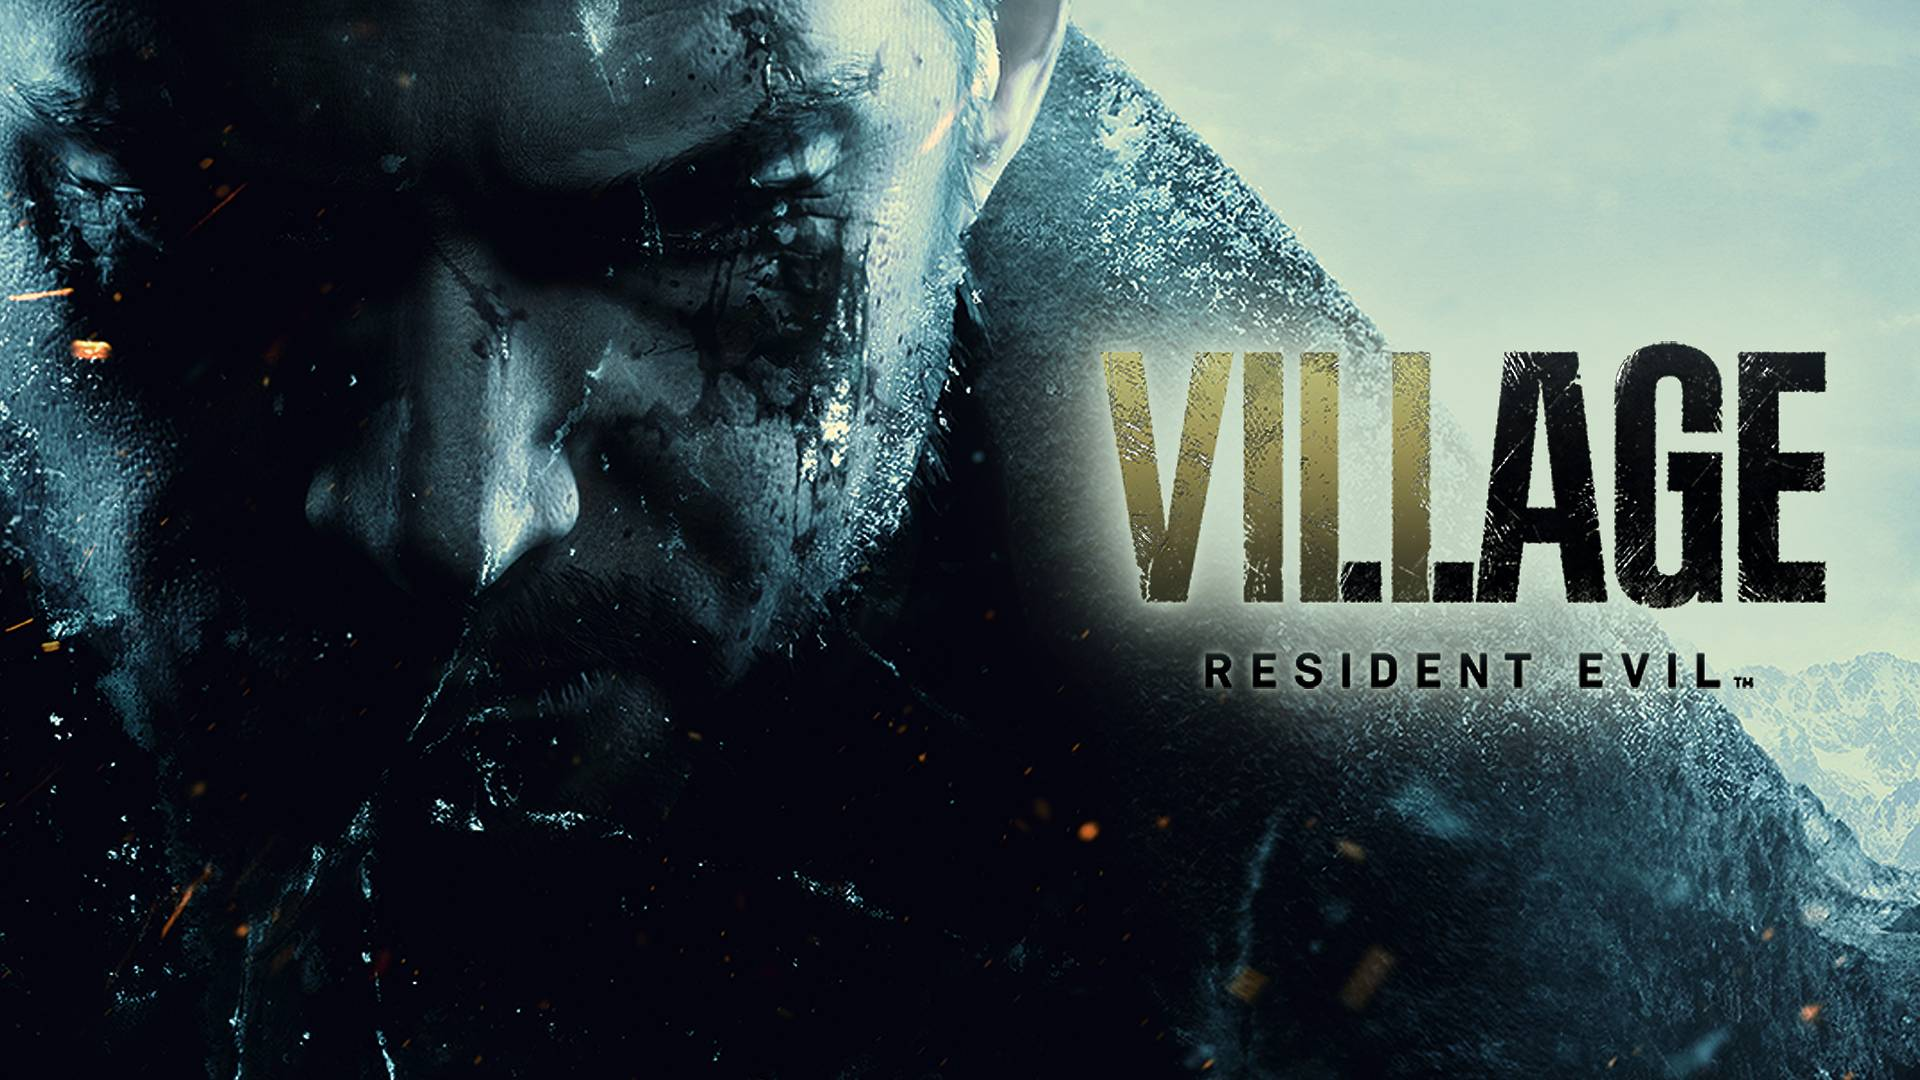 Resident Evil Village Director Teases Open World Exploration, Capcom Considering Bringing It To Current-Gen Consoles